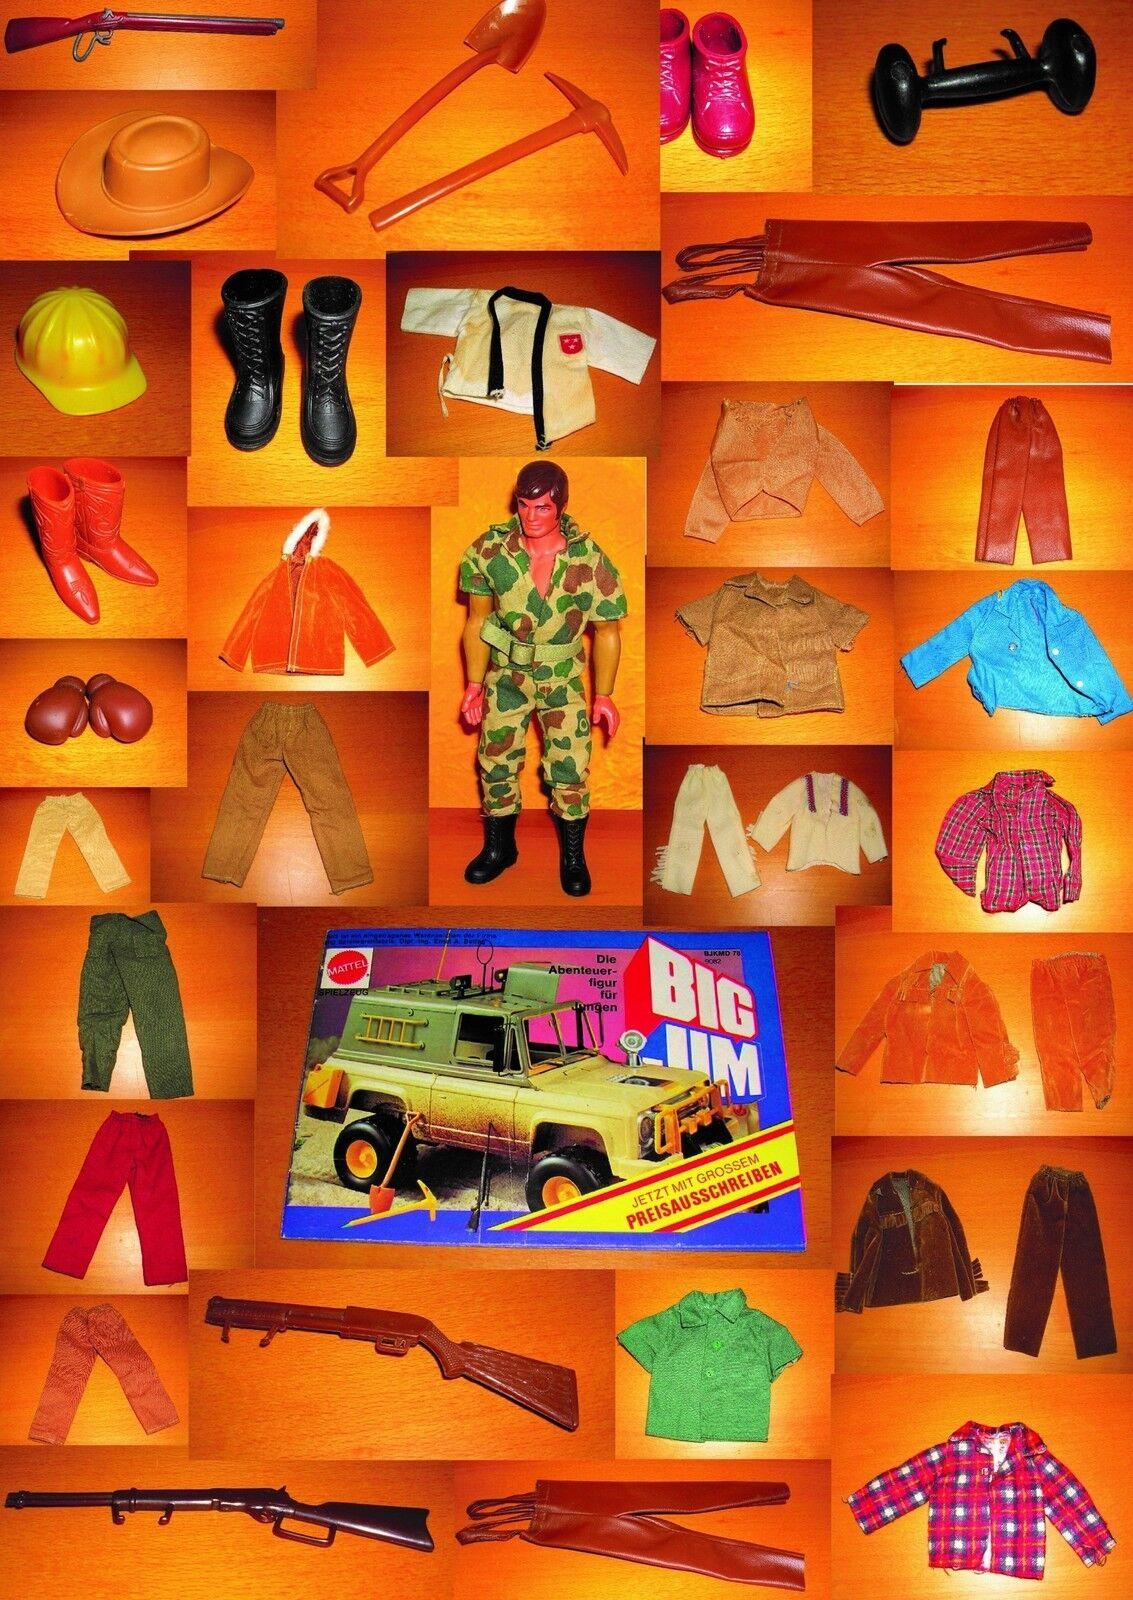 Big Jim Outfits Zubehör Mattel Kleider Waffe Ersatzteile Set Karl May Camping 6